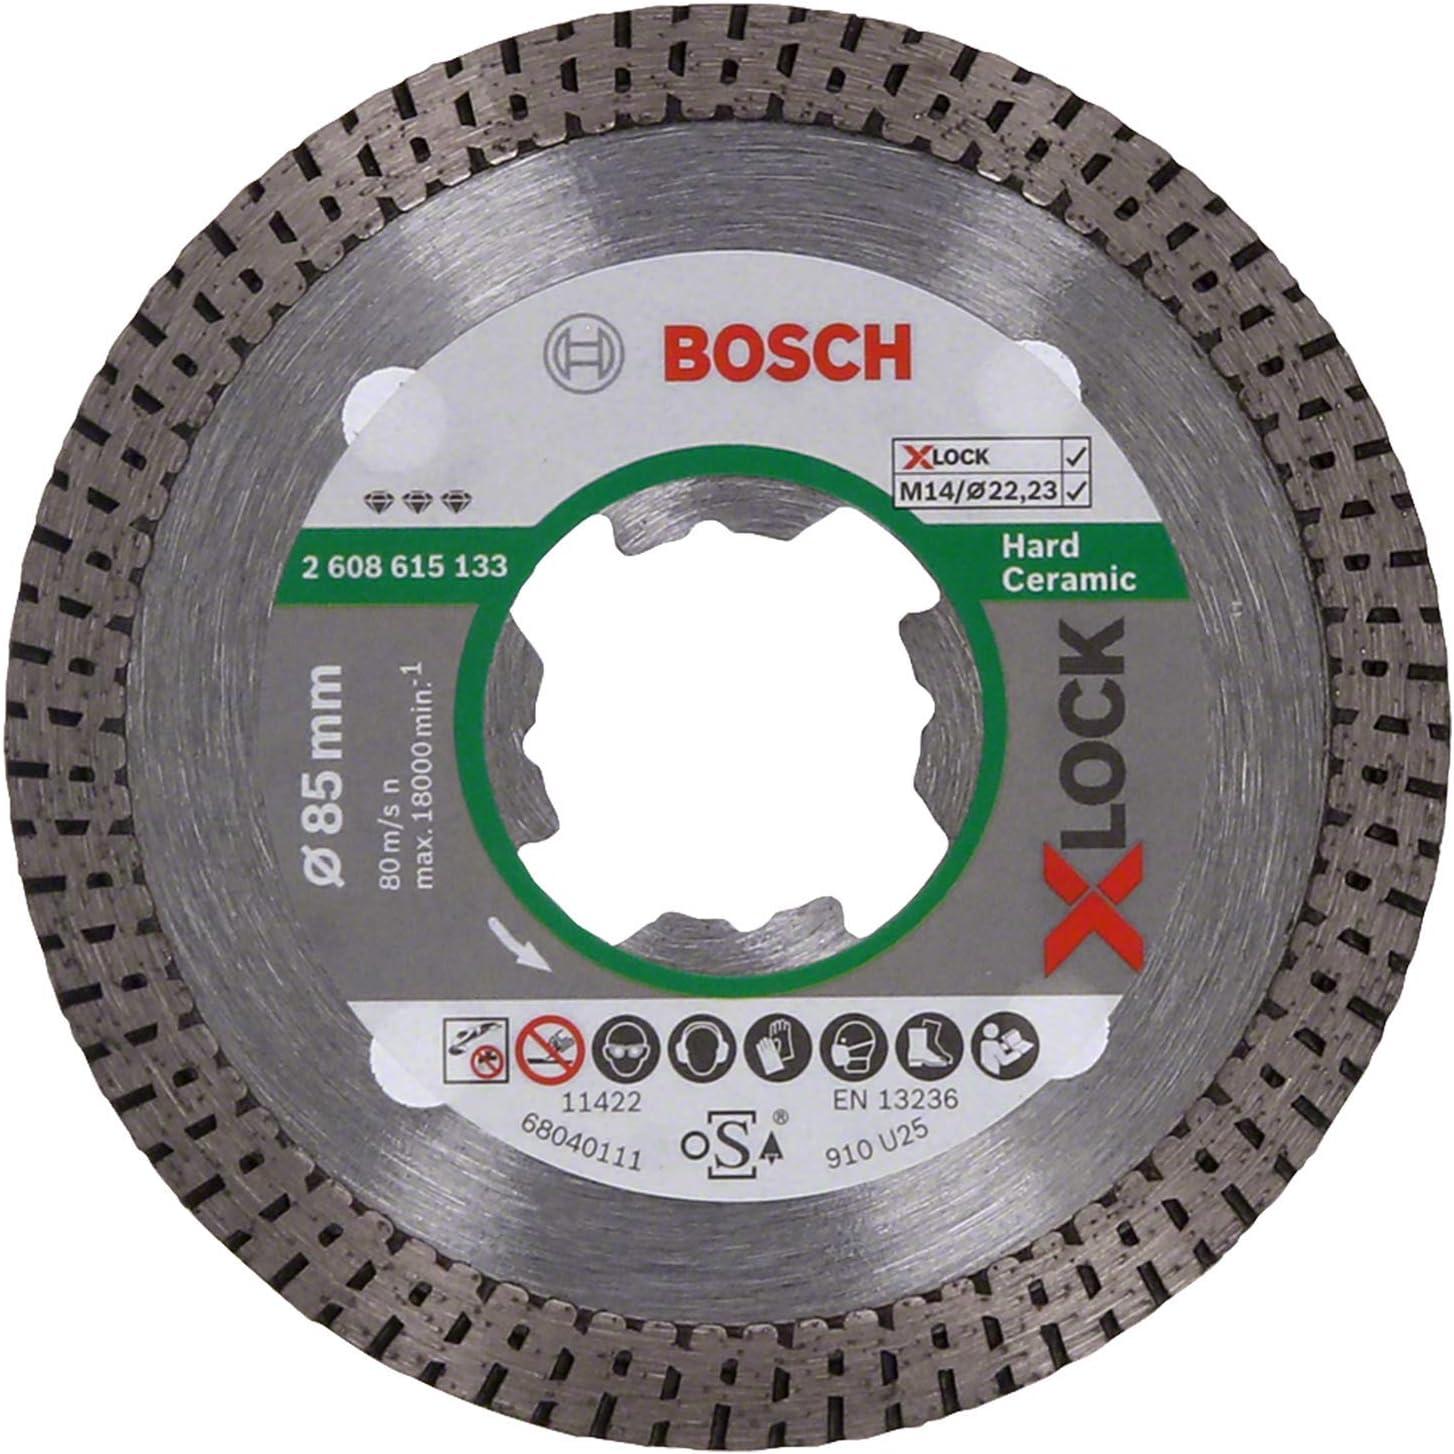 Bosch Professional Best - Disco de corte de diamante (para cerámica dura, X-LOCK, Ø85 mm, diámetro del orificio: 22,23 mm)